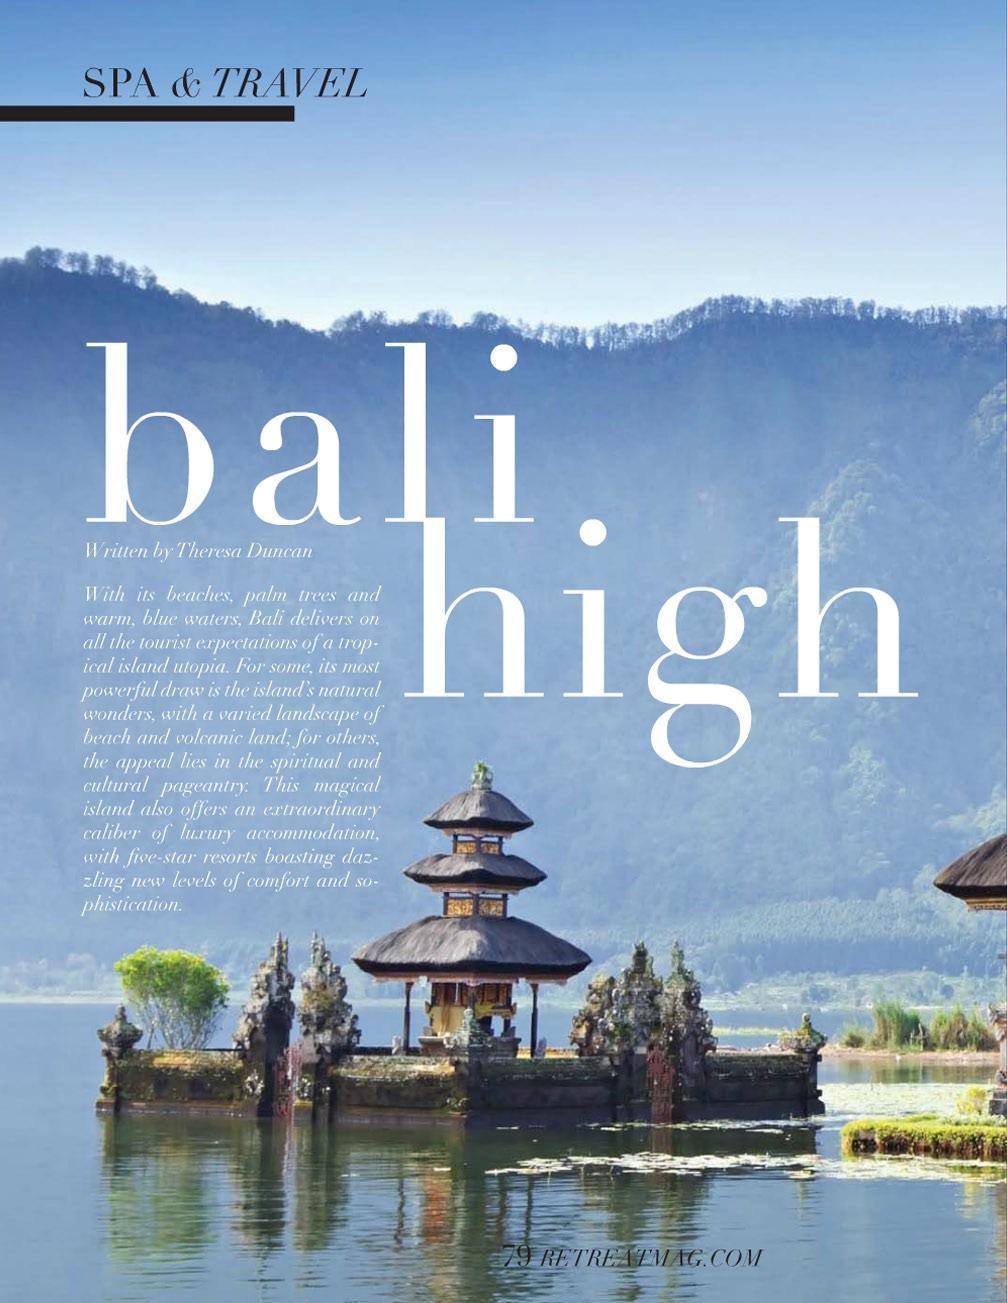 RETREAT-Magazine-Hotel-Tugu-Bali-092015-cover